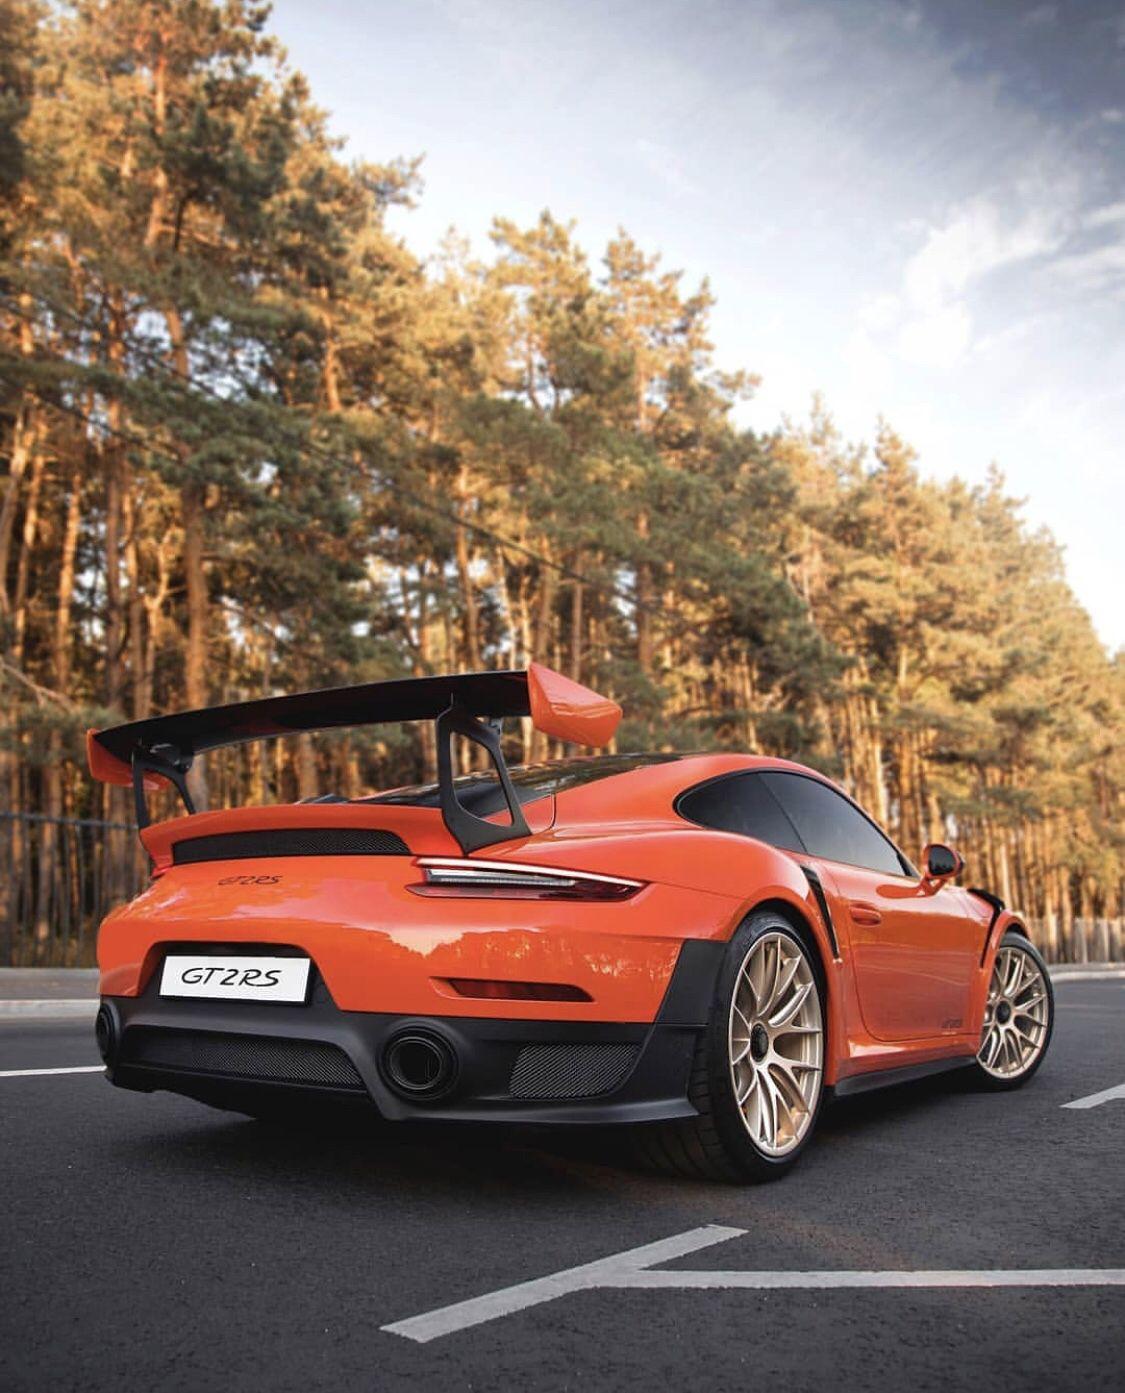 Porsche Gt2rs Porsche Luxury Cars Porsche Gt